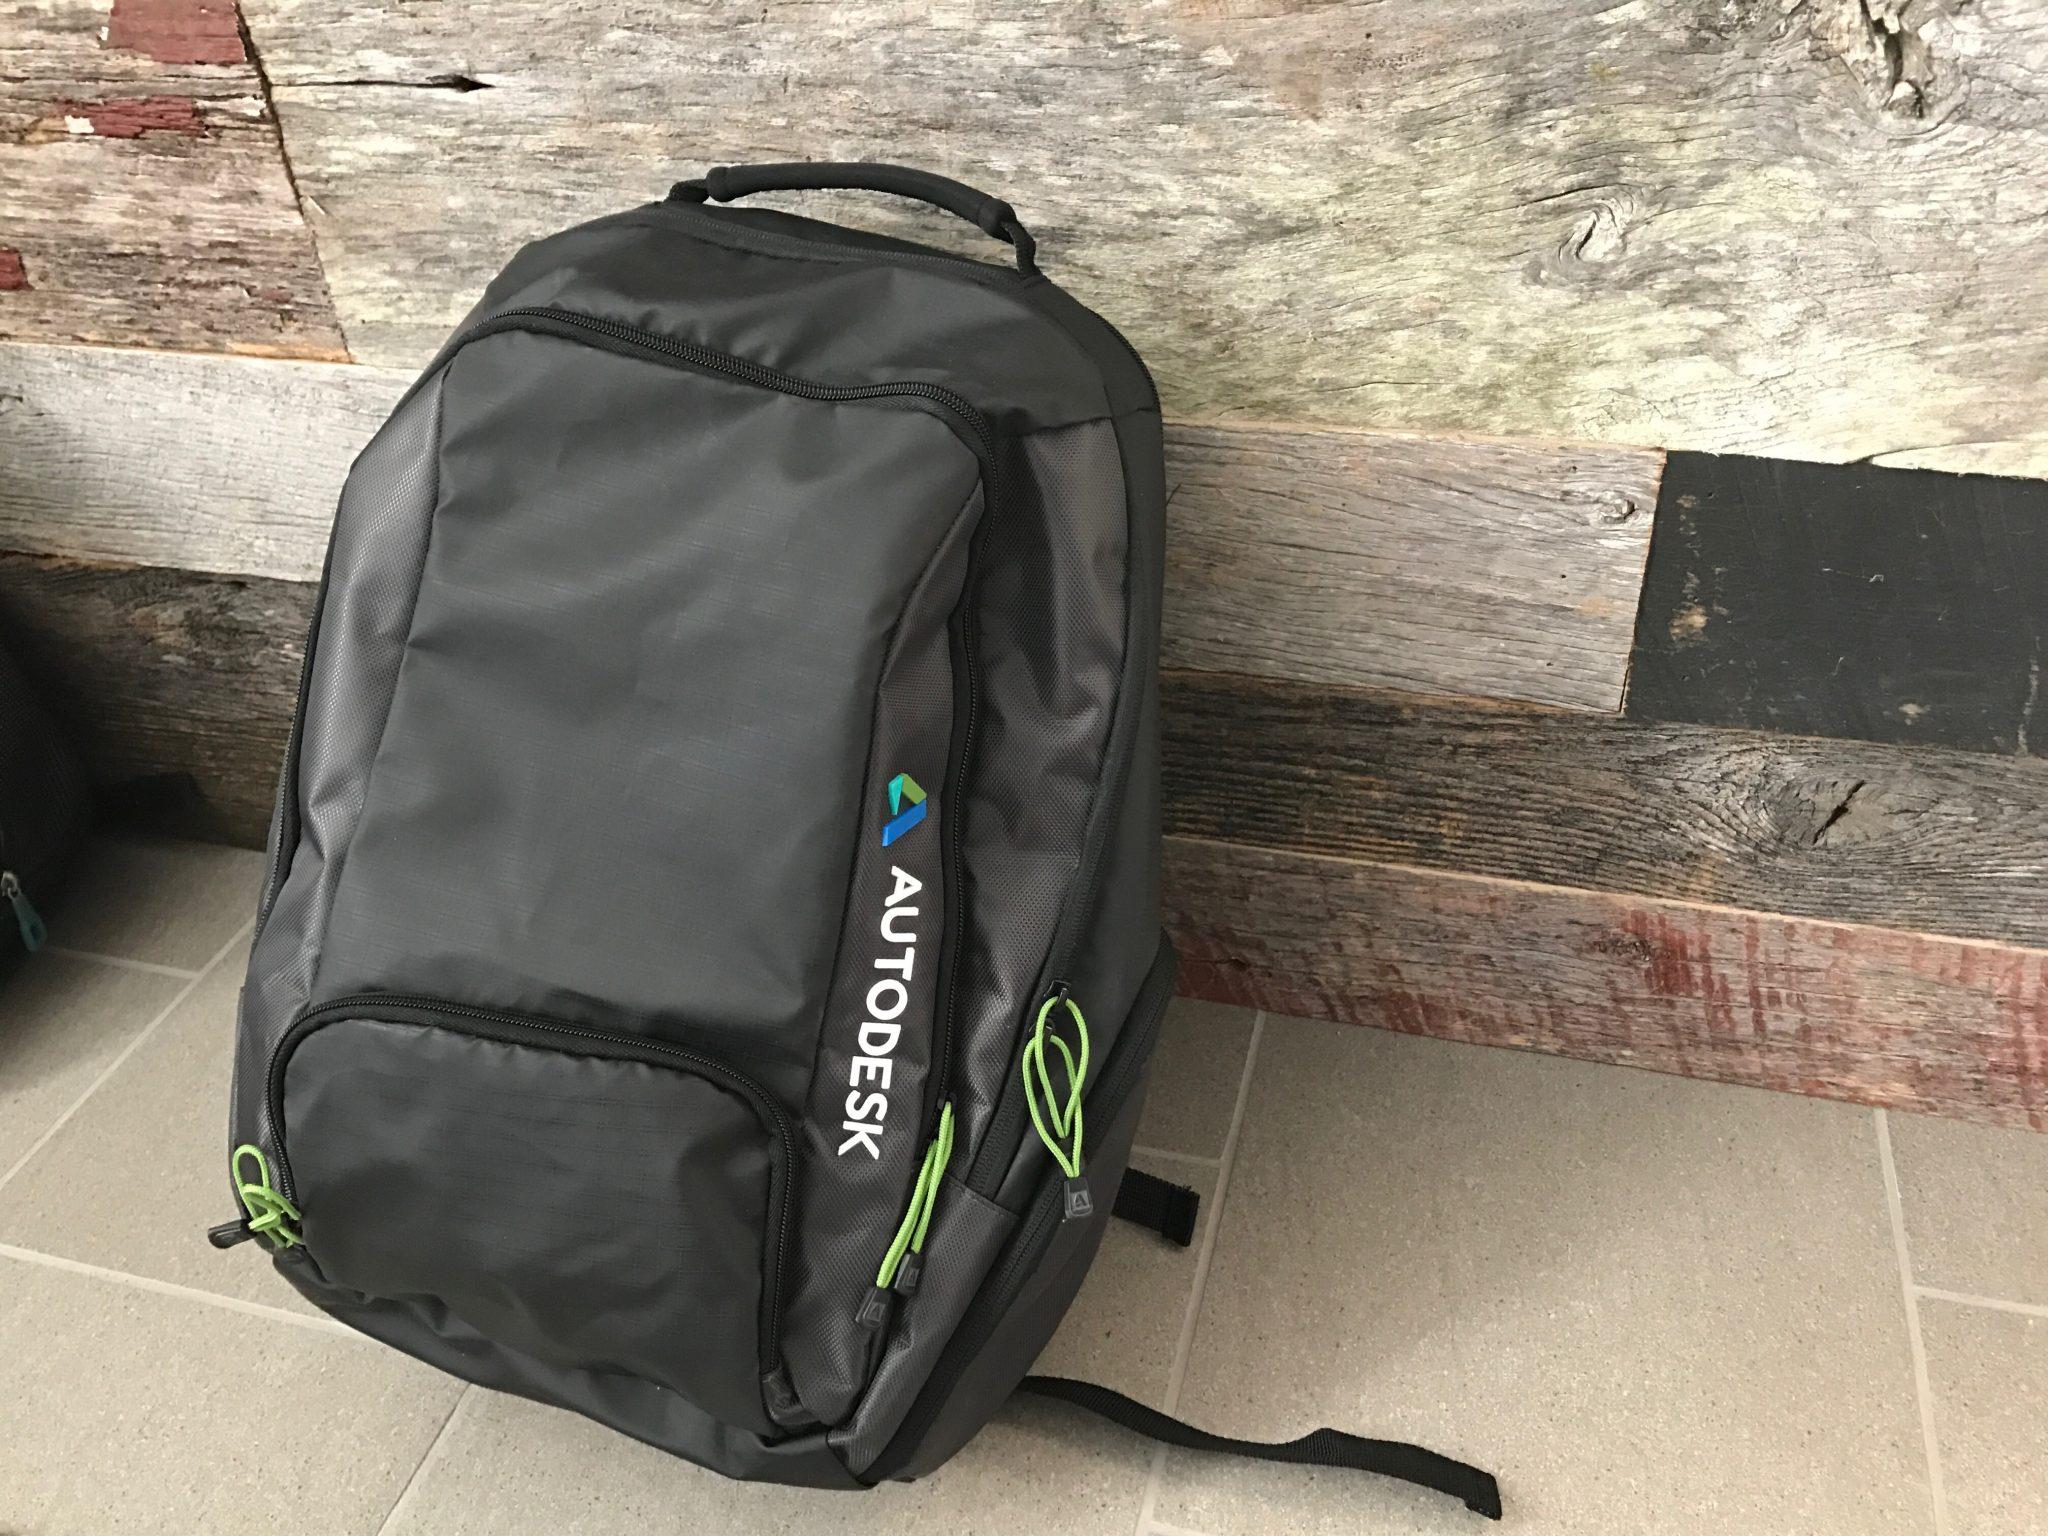 Autodesk University 2016 Backpack